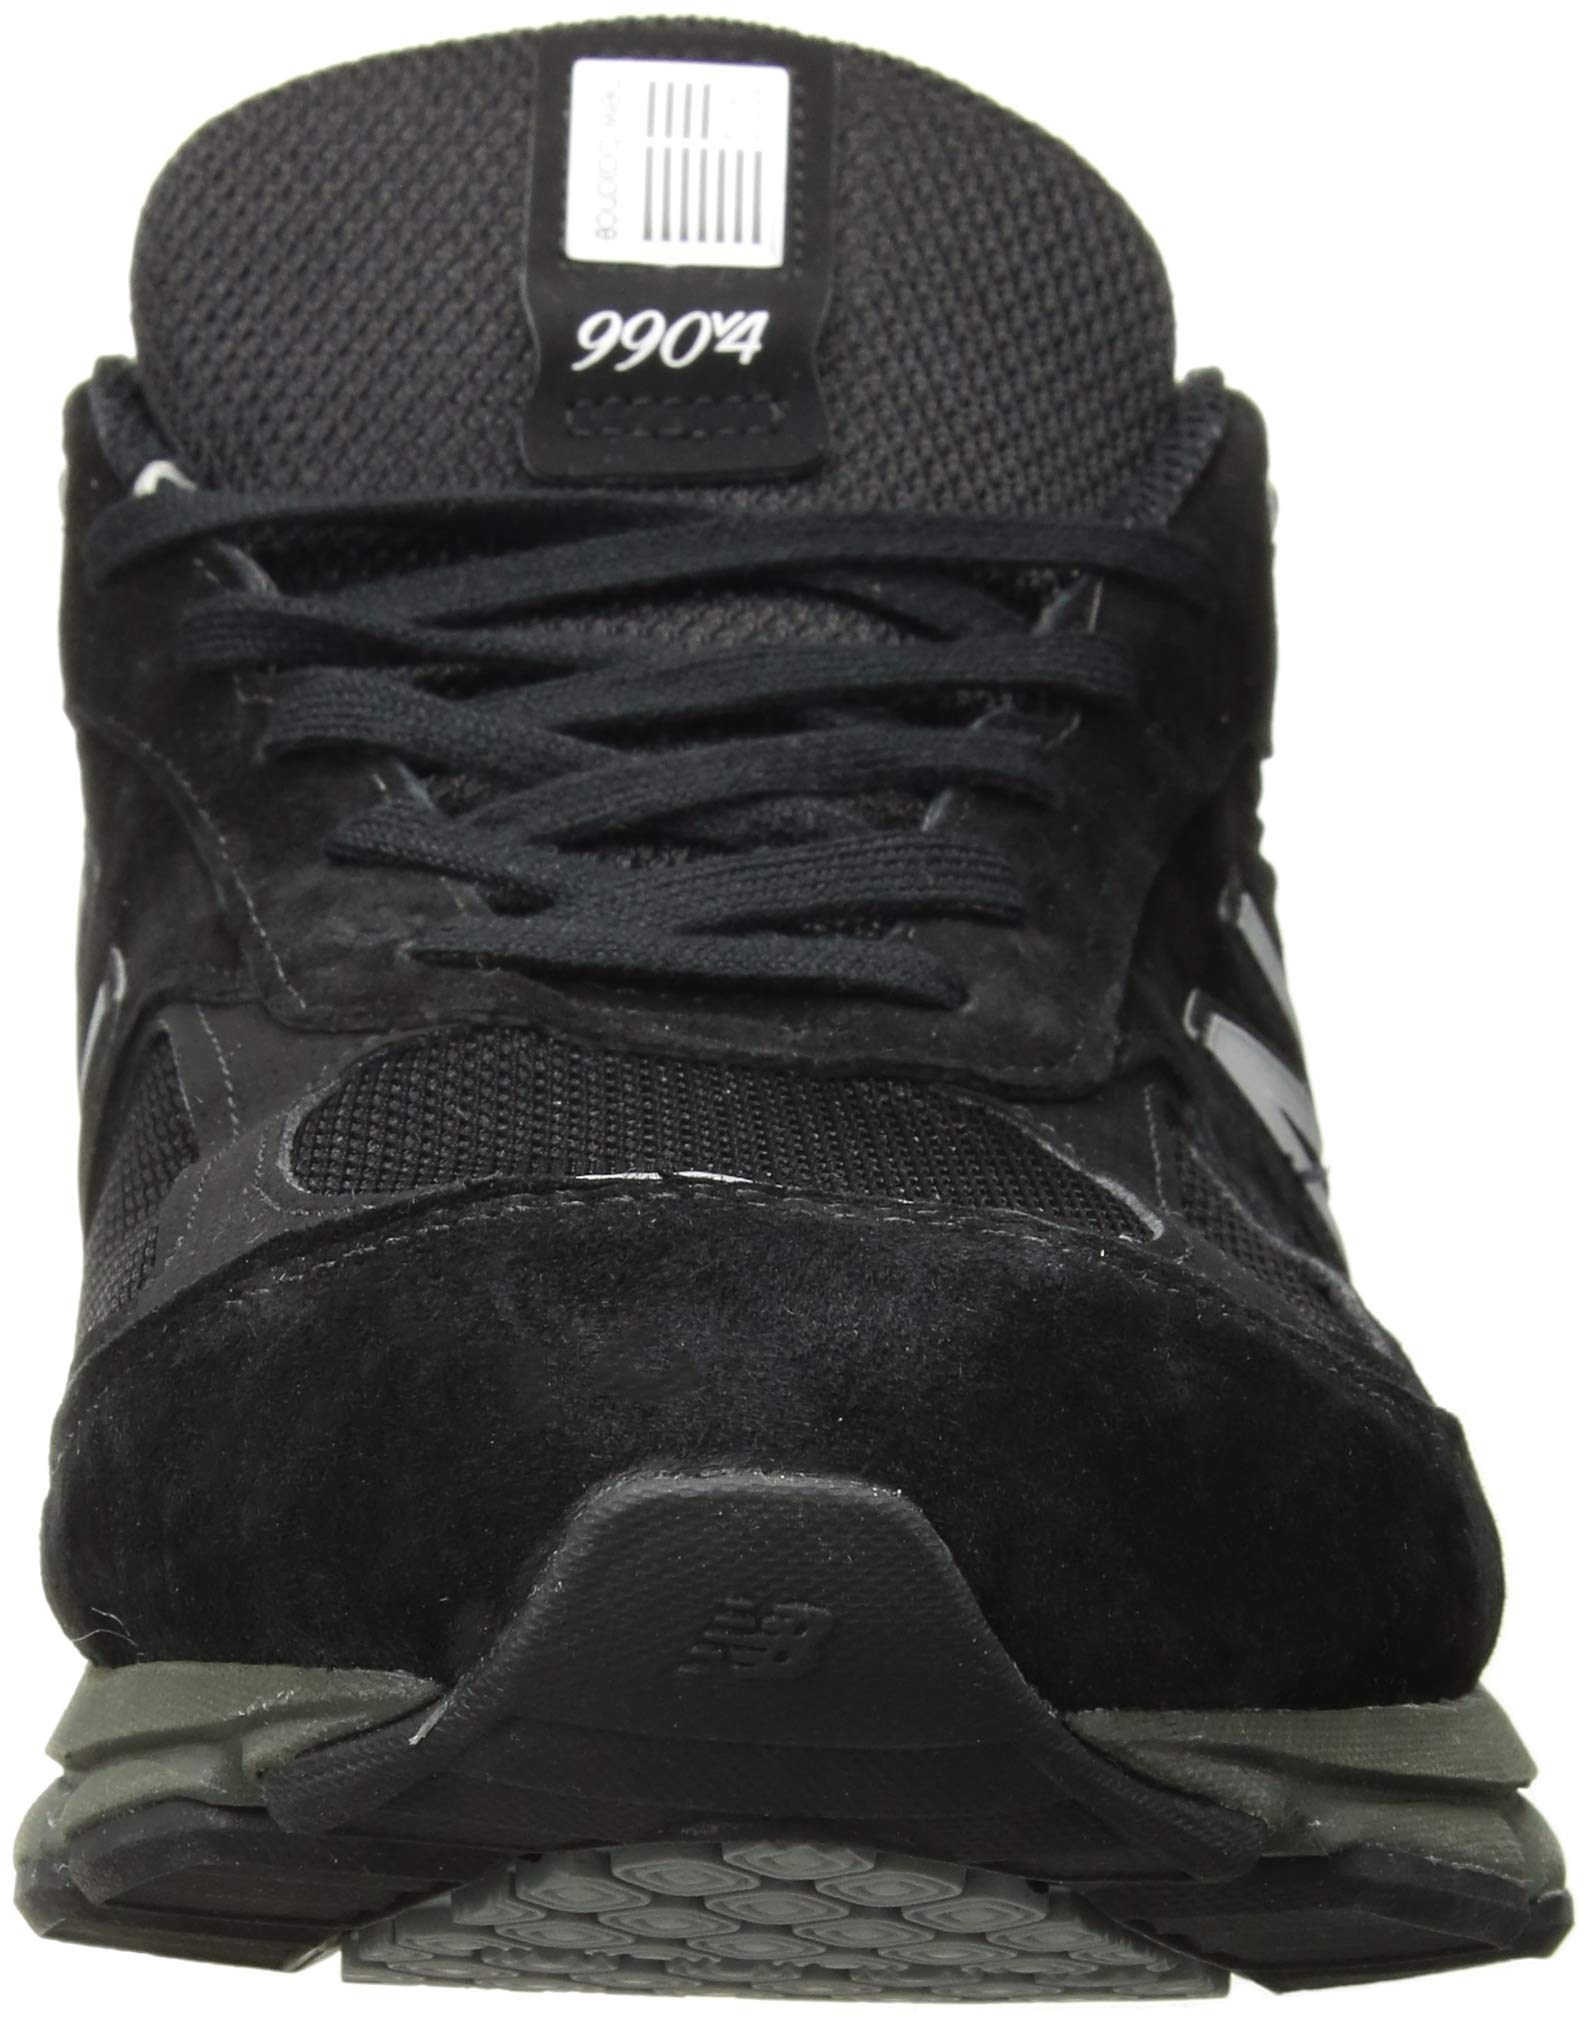 71 QxefKtbL - New Balance Mens M990 990v4 Black Size: 7.5 Wide